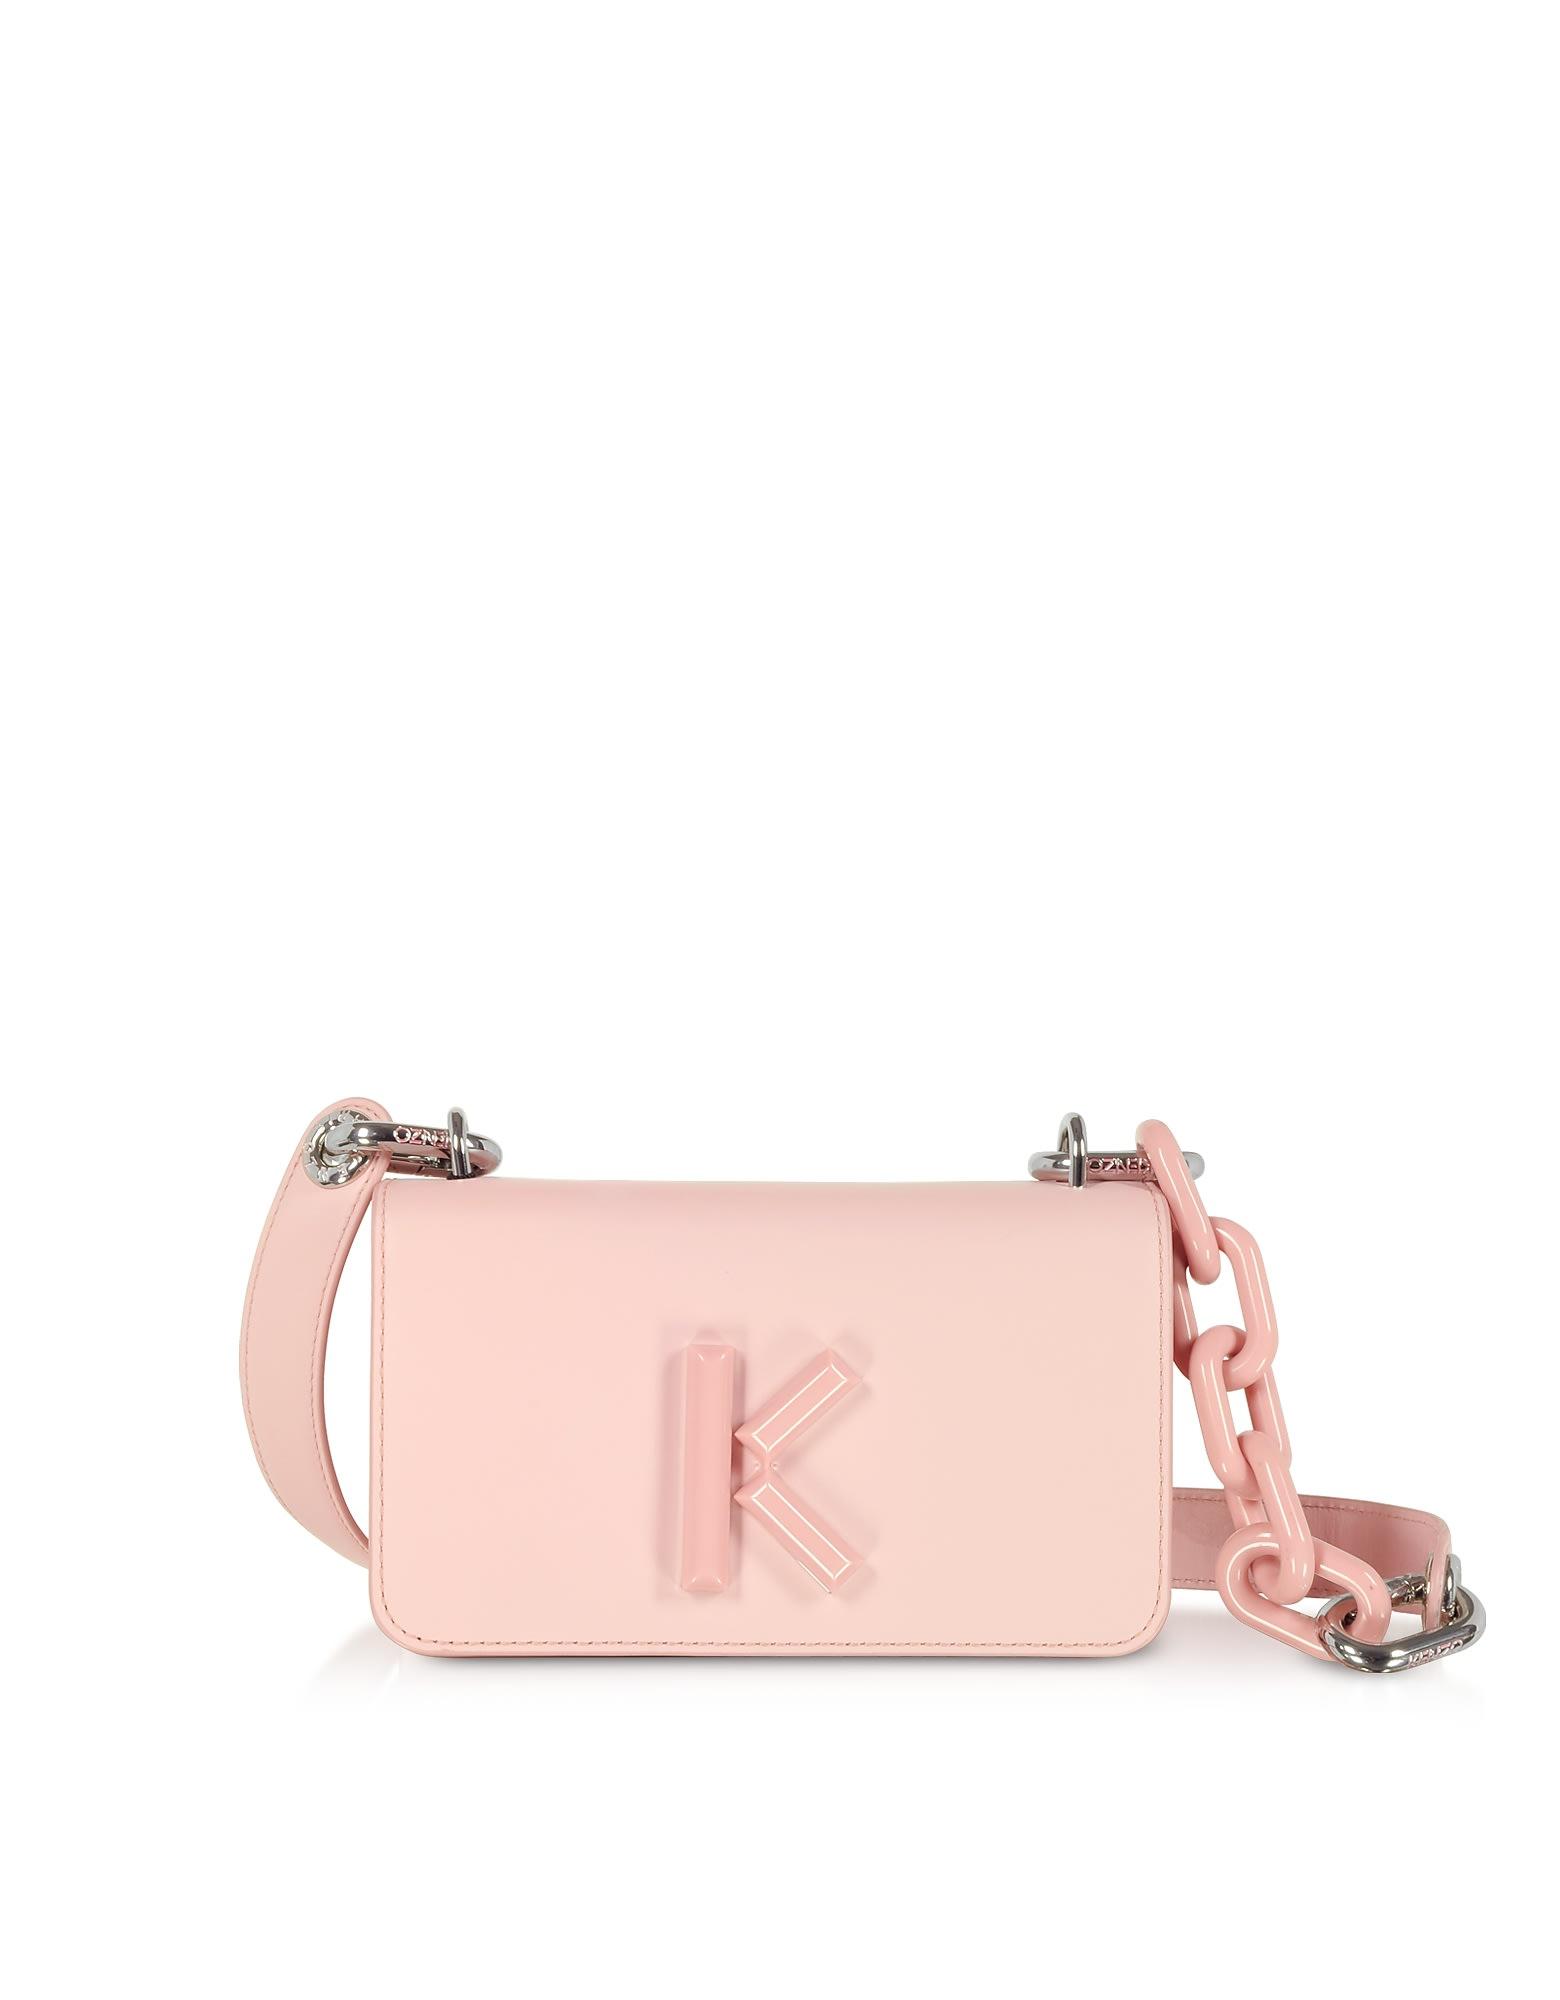 Kenzo Kandy Crossbody Bag